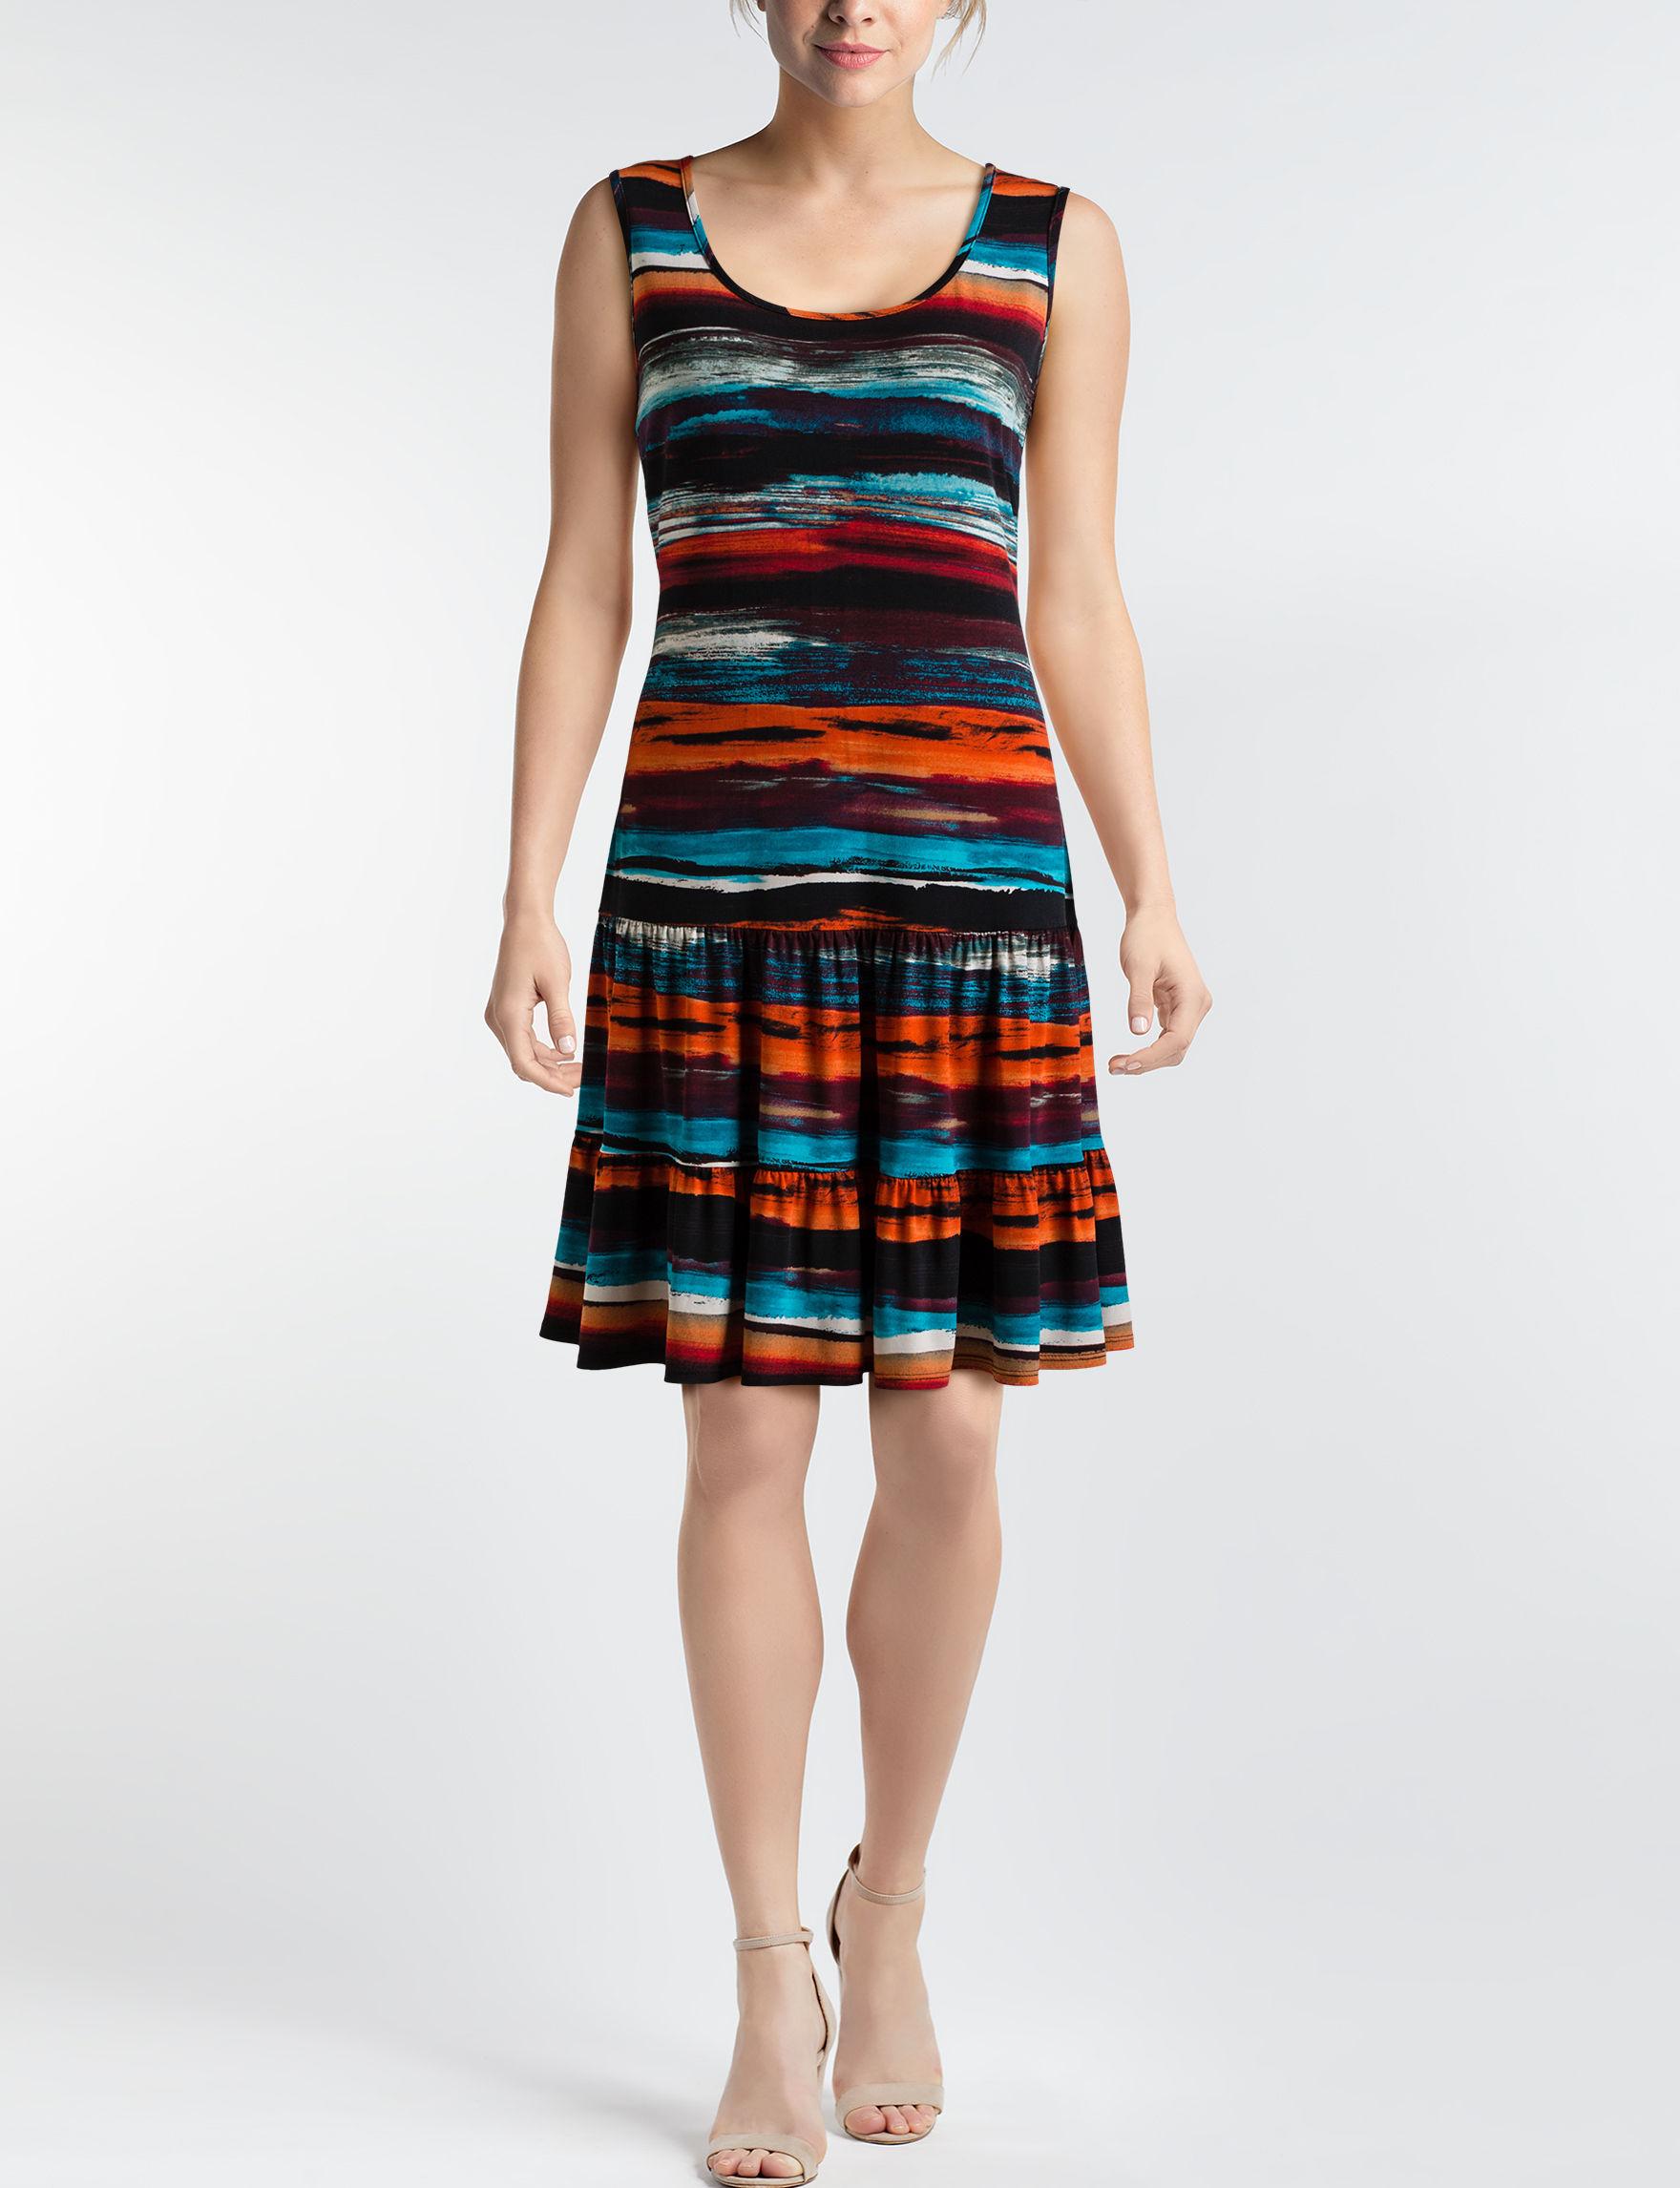 Ronni Nicole Black / Orange Everyday & Casual Shift Dresses